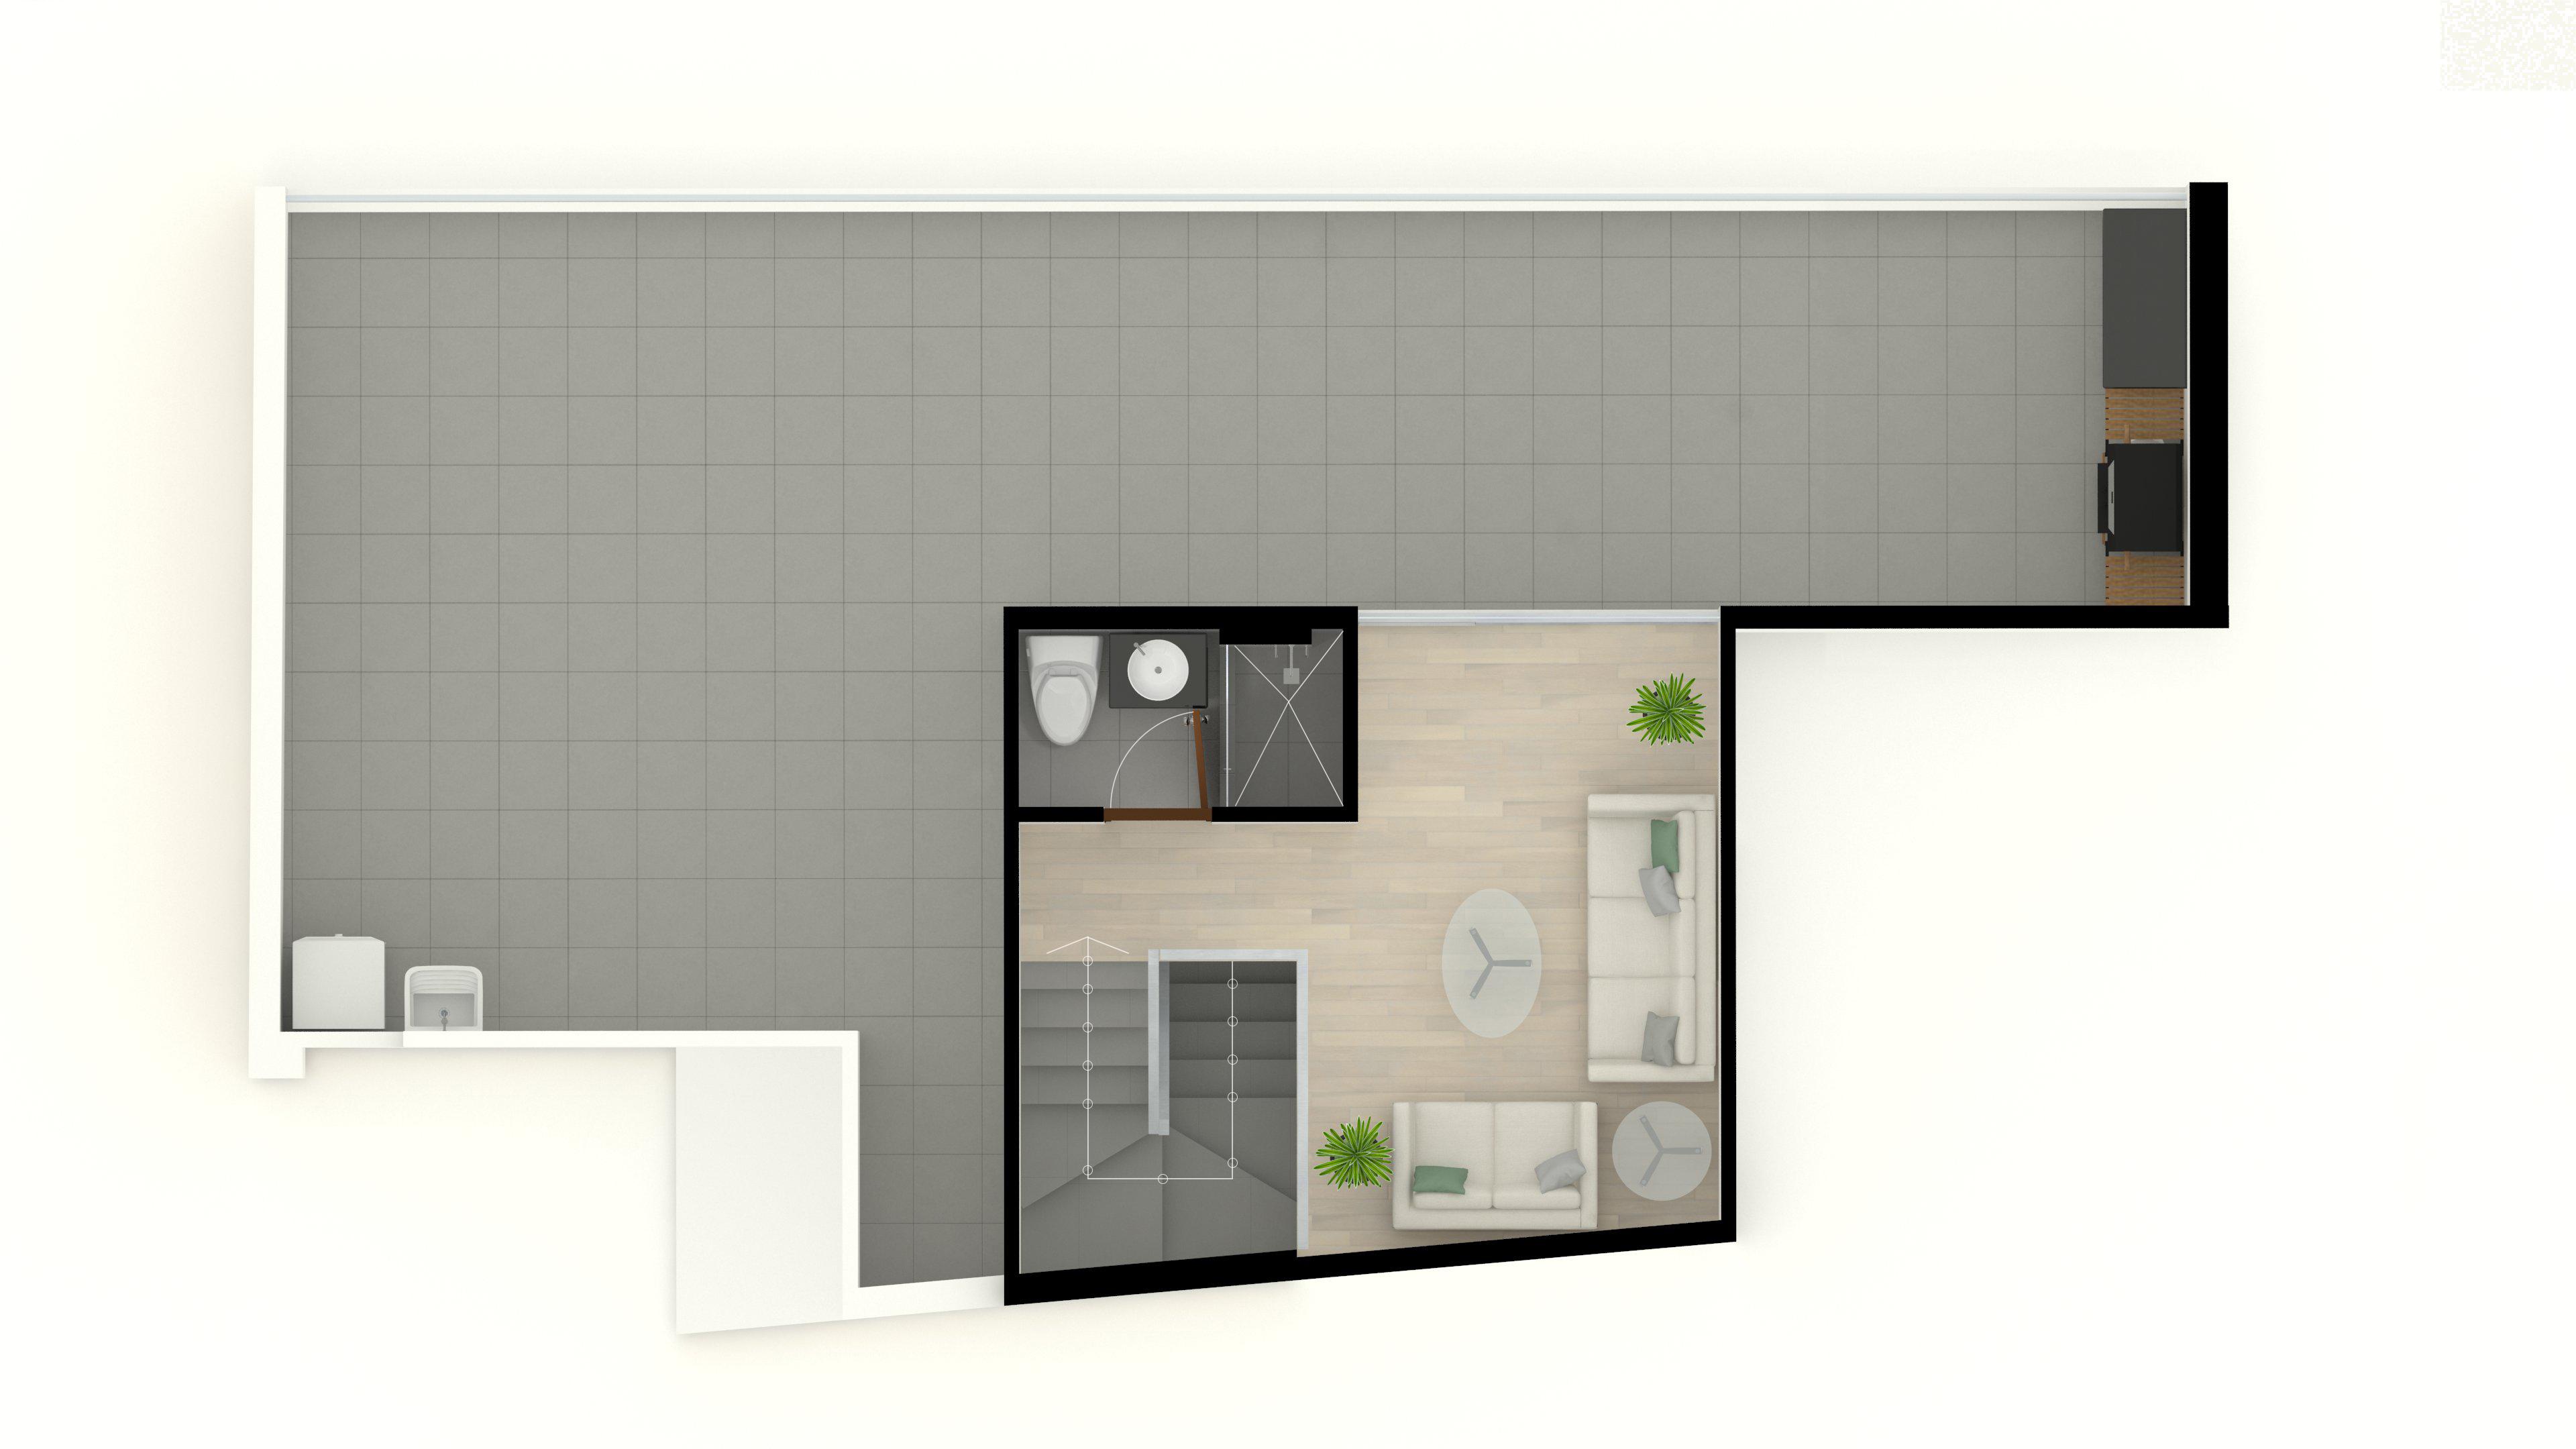 7. Duplex 502 6to piso 18m2 (Segundo Nivel)